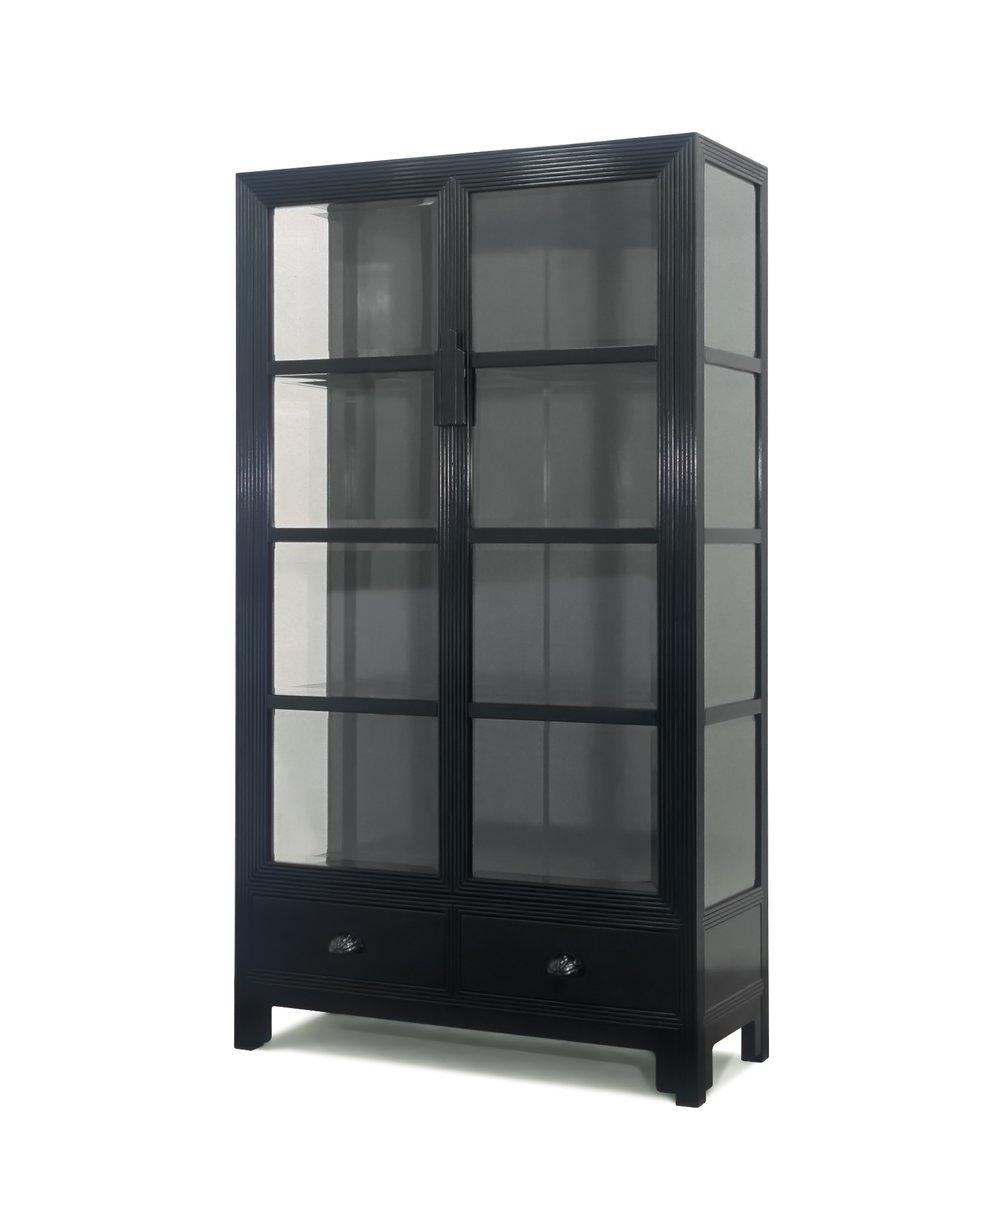 ....Art deco style furniture : display cabinet..艺术装饰风格家具:展示柜....